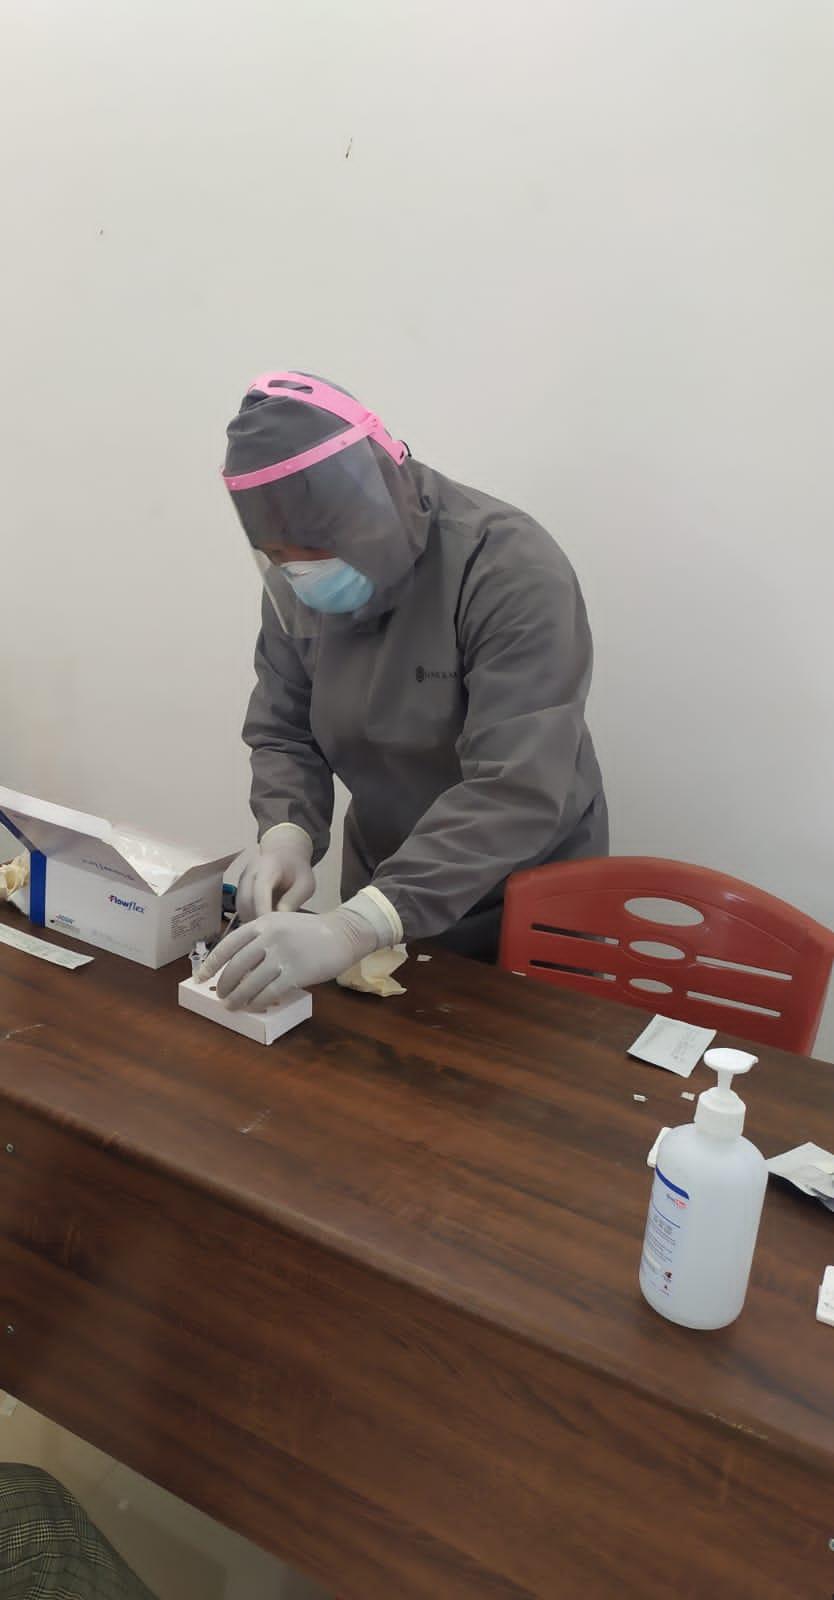 Tim Covid-19 Puskesmas Kalis Laksanakan Swab Antigen Untuk 13 Orang, Termasuk Nakes